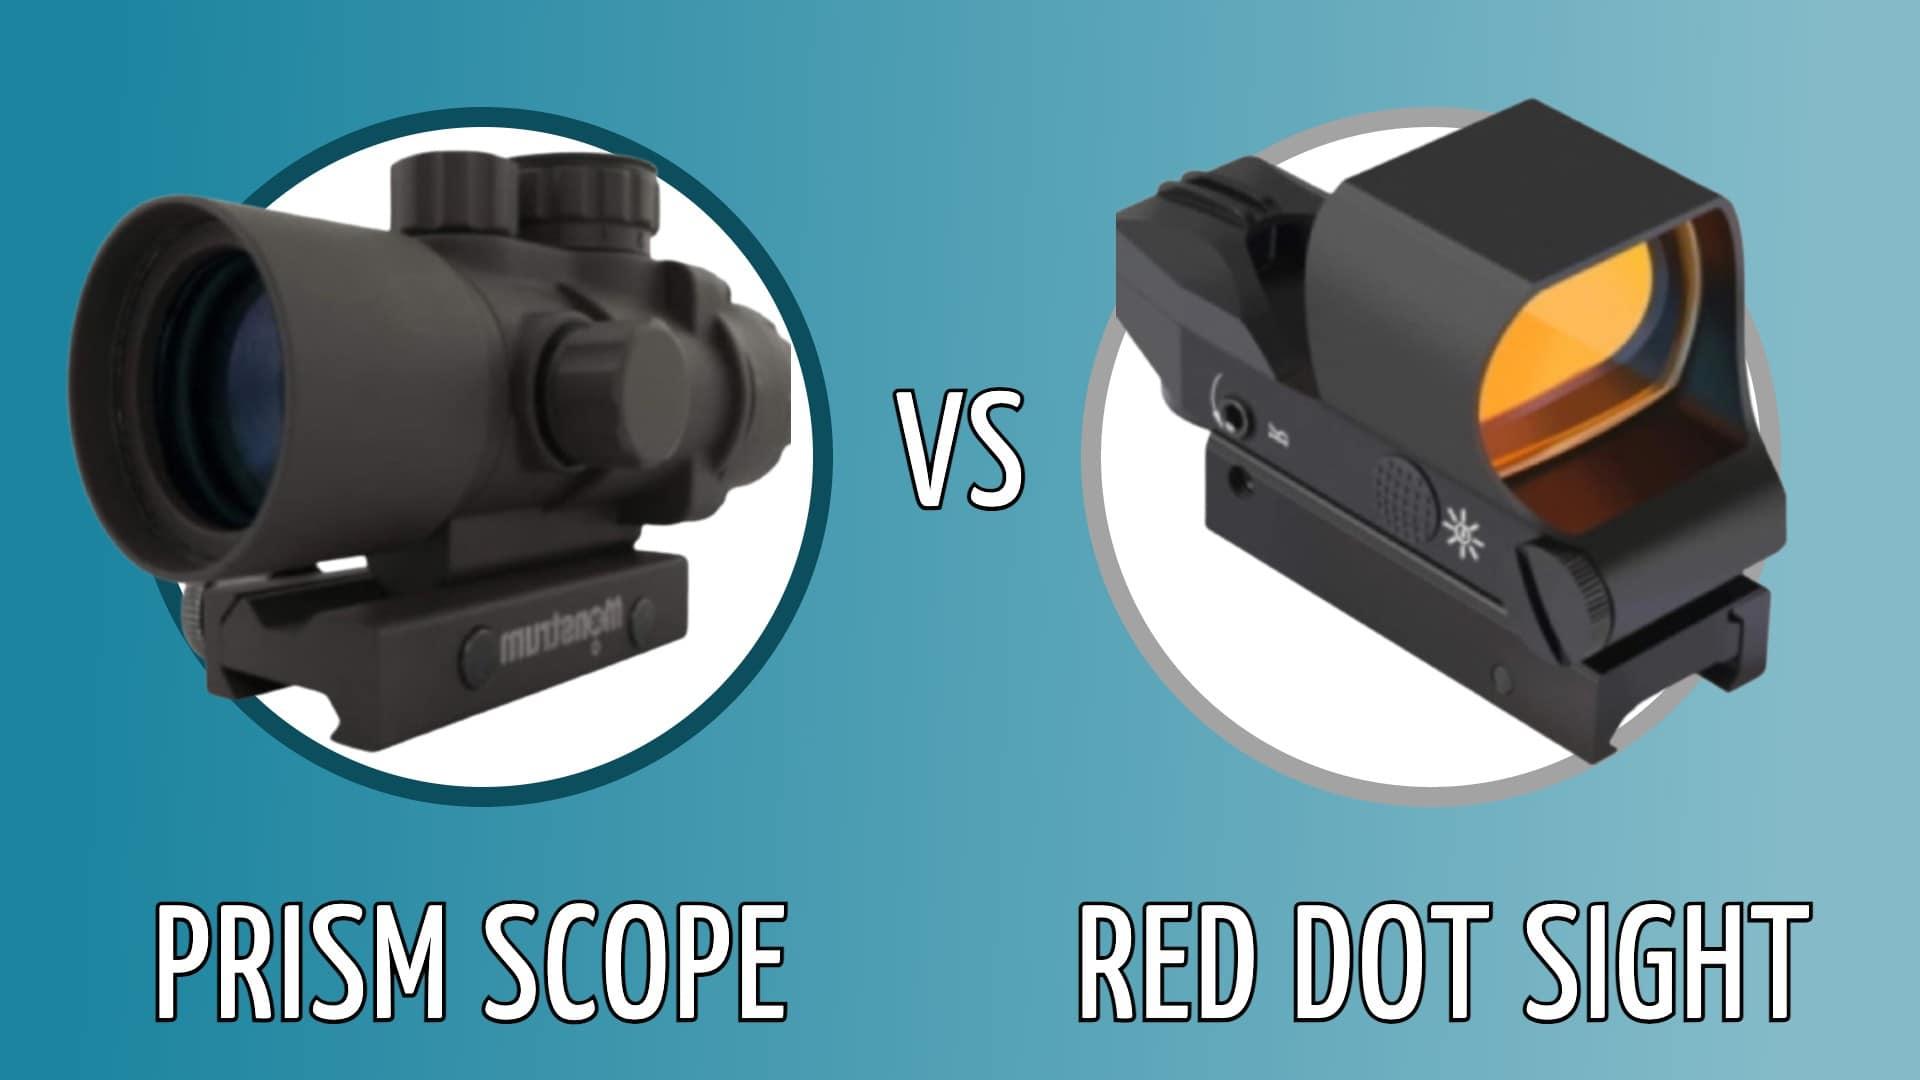 prism scope vs red dot sight